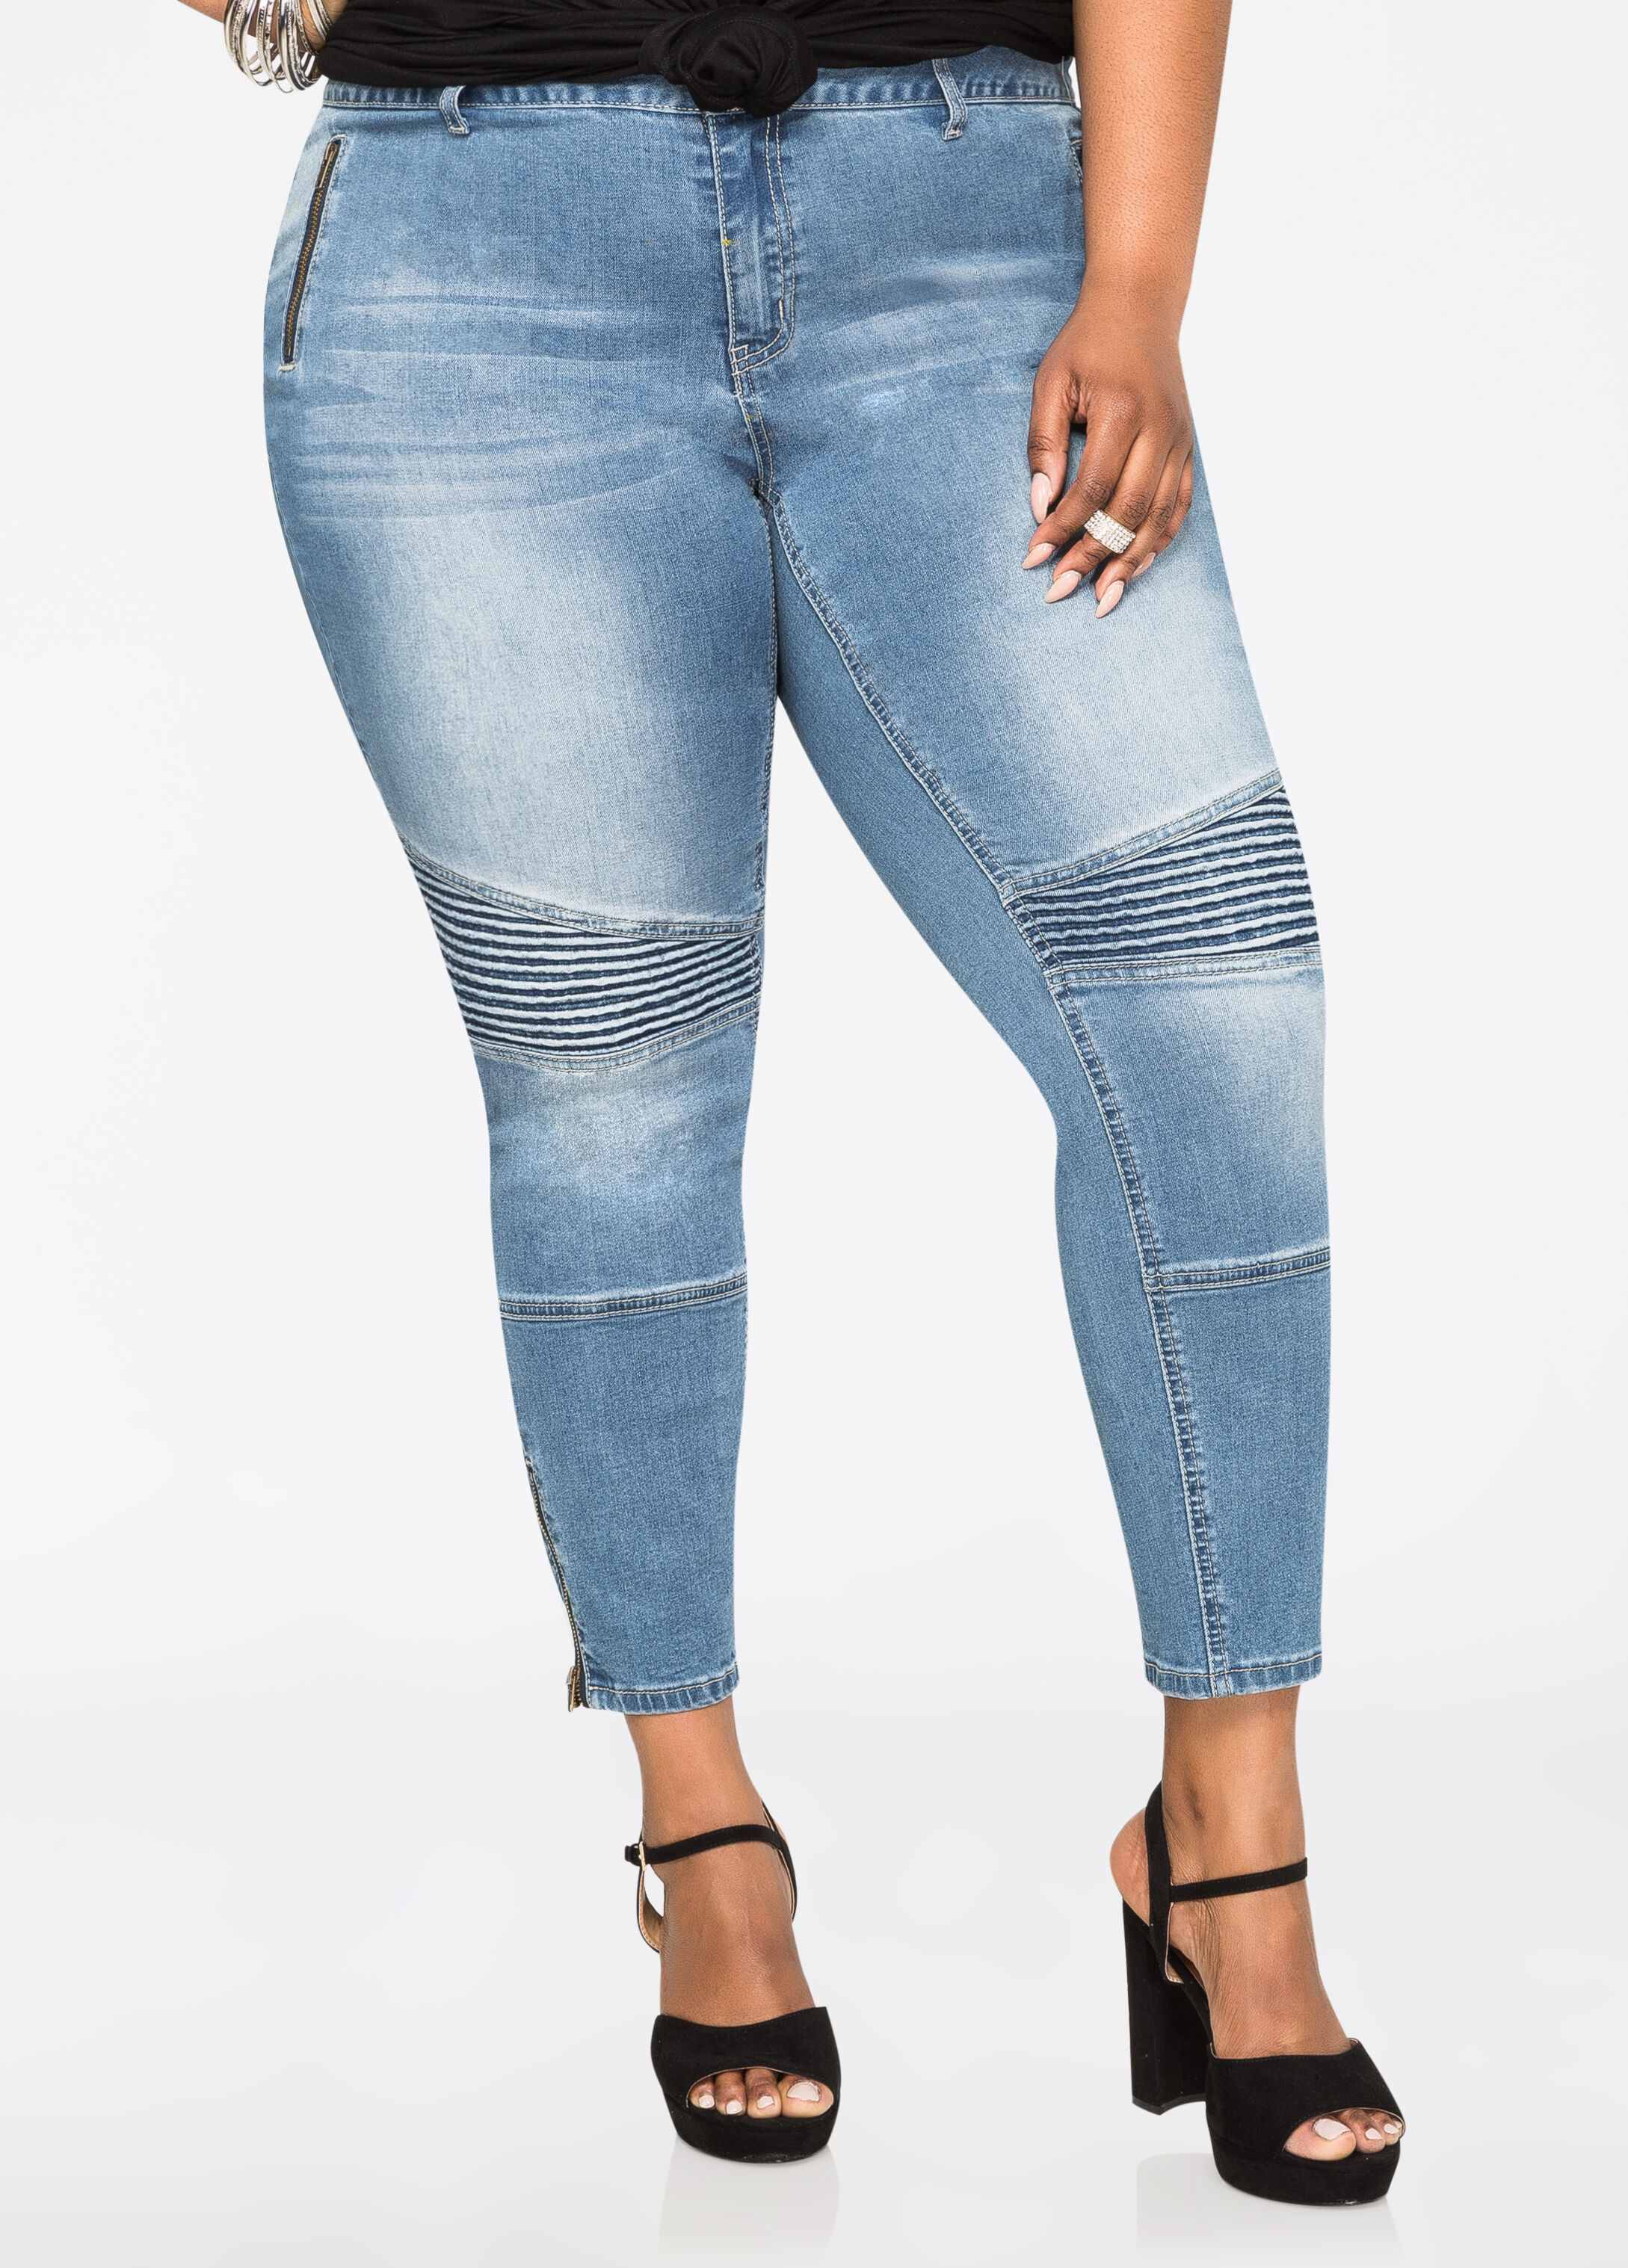 Size 28 Jeans | Size 30 Jeans + More Denim | Ashley Stewart